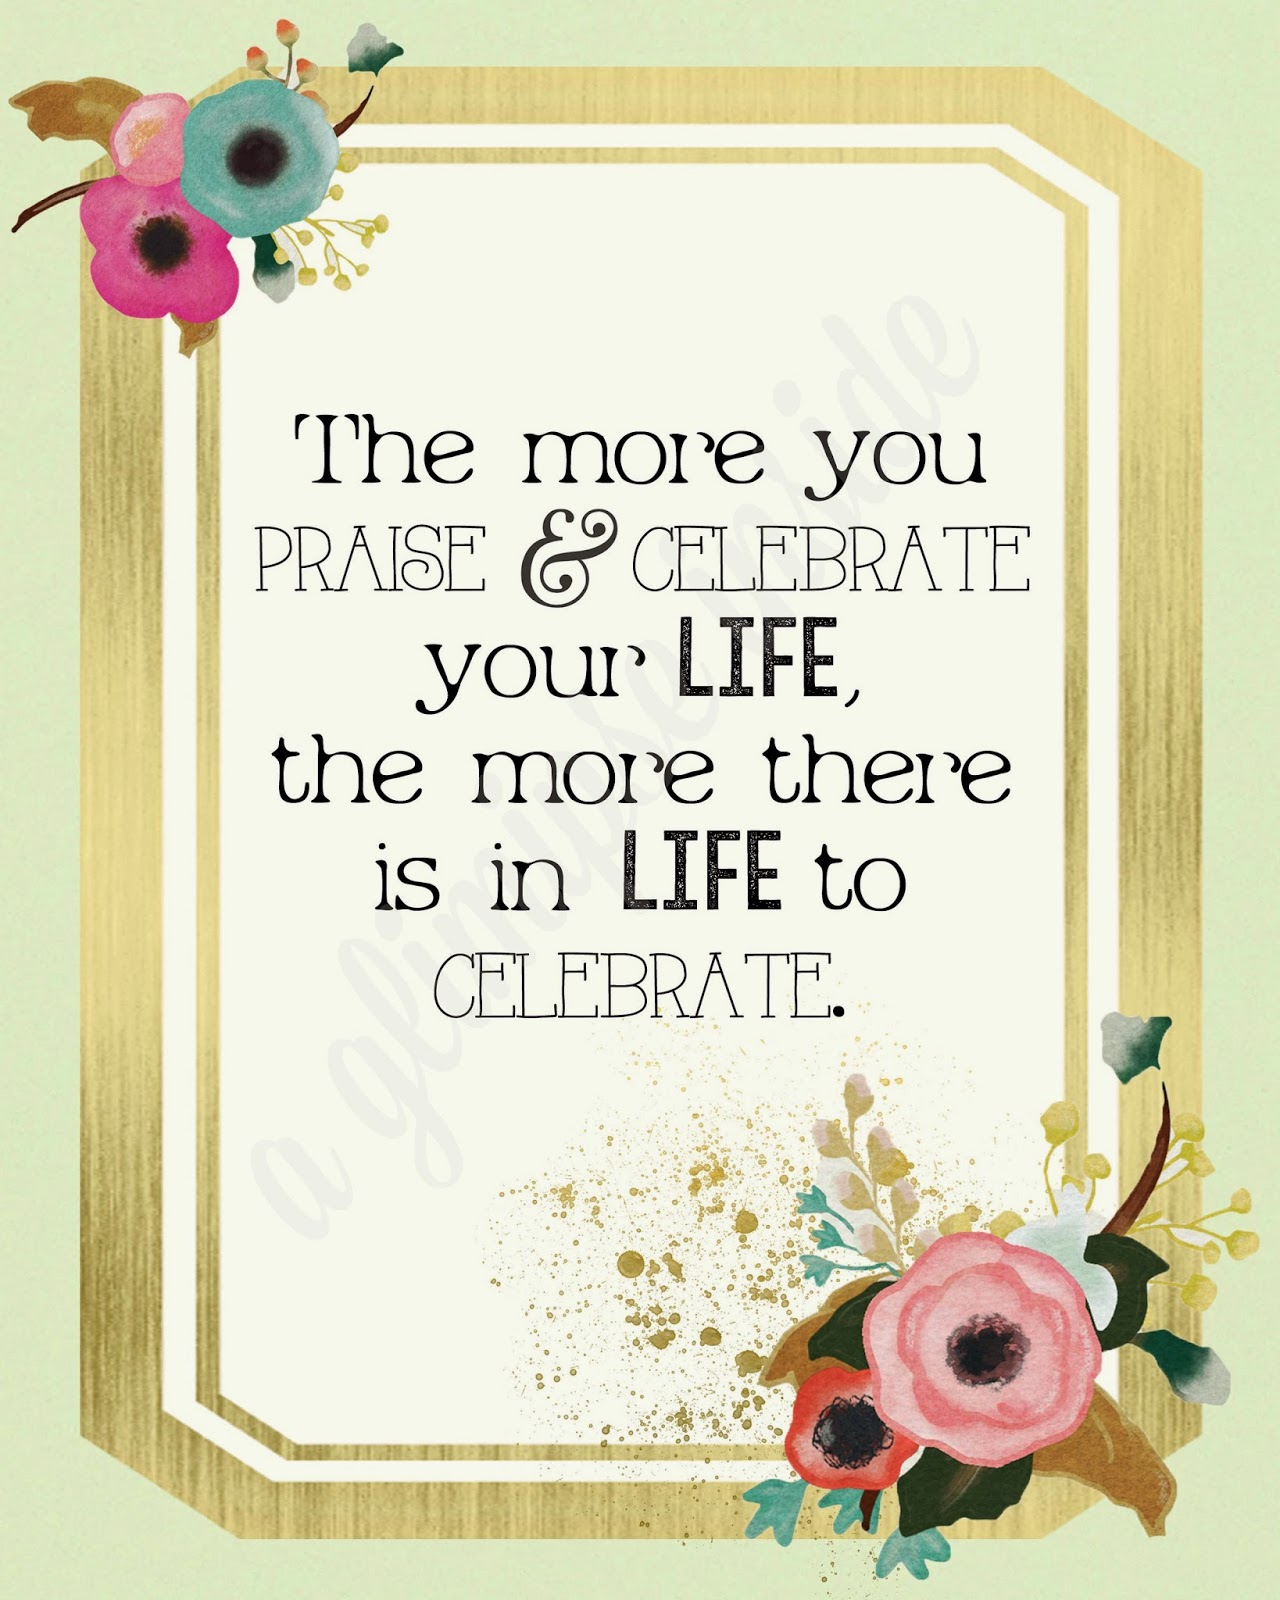 http://www.aglimpseinsideblog.com/2015/03/celebrate-life-printable.html